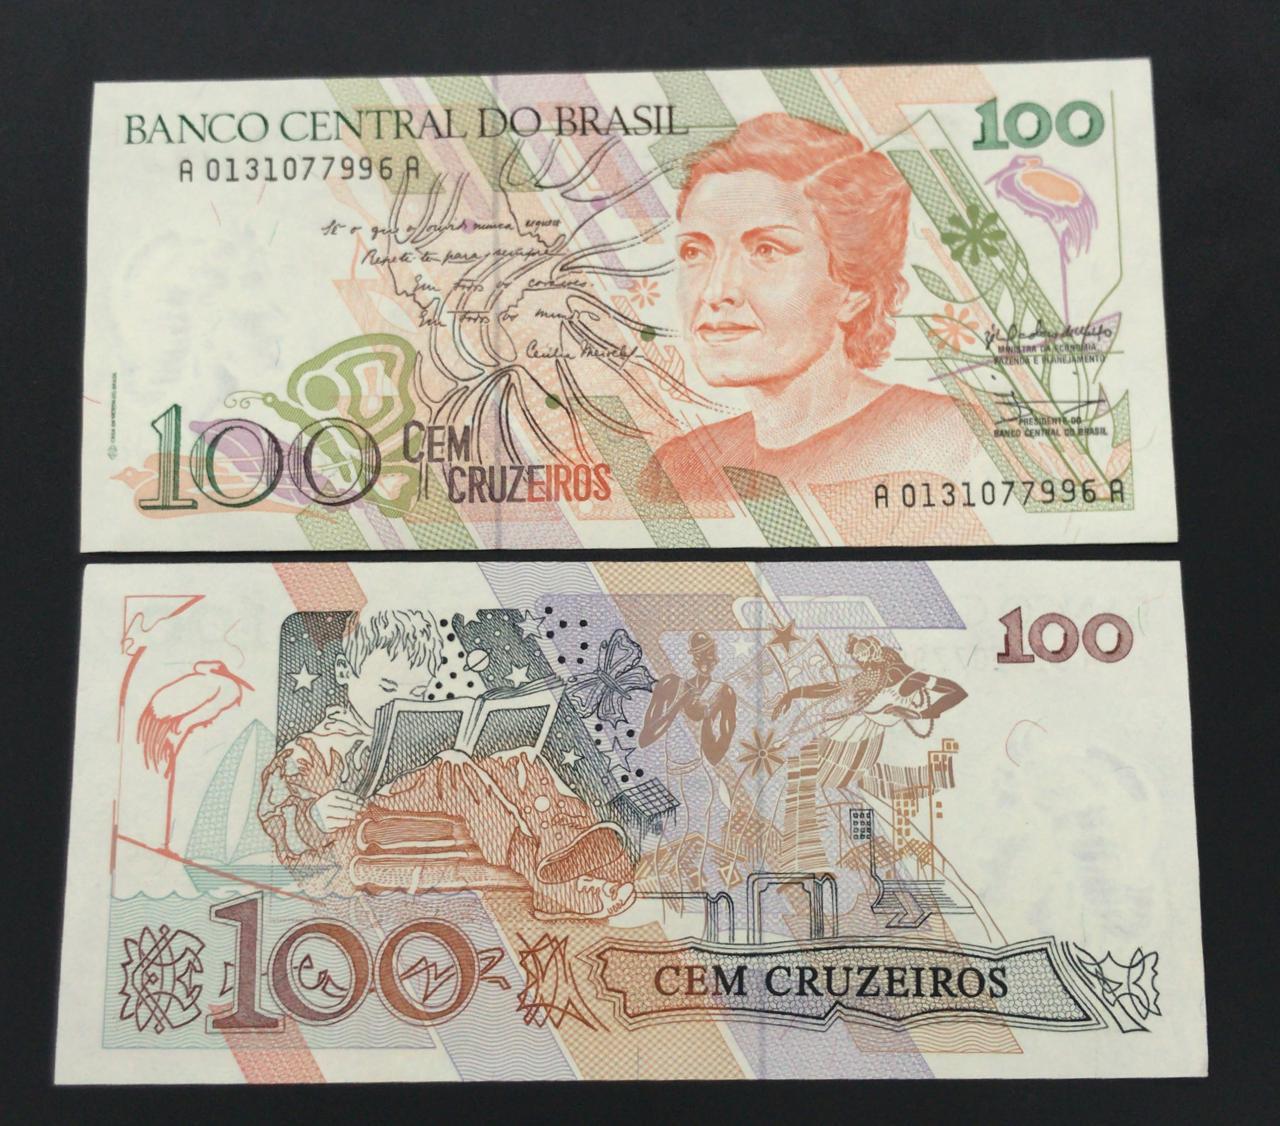 C214 - 100 Cruzeiros (FE)